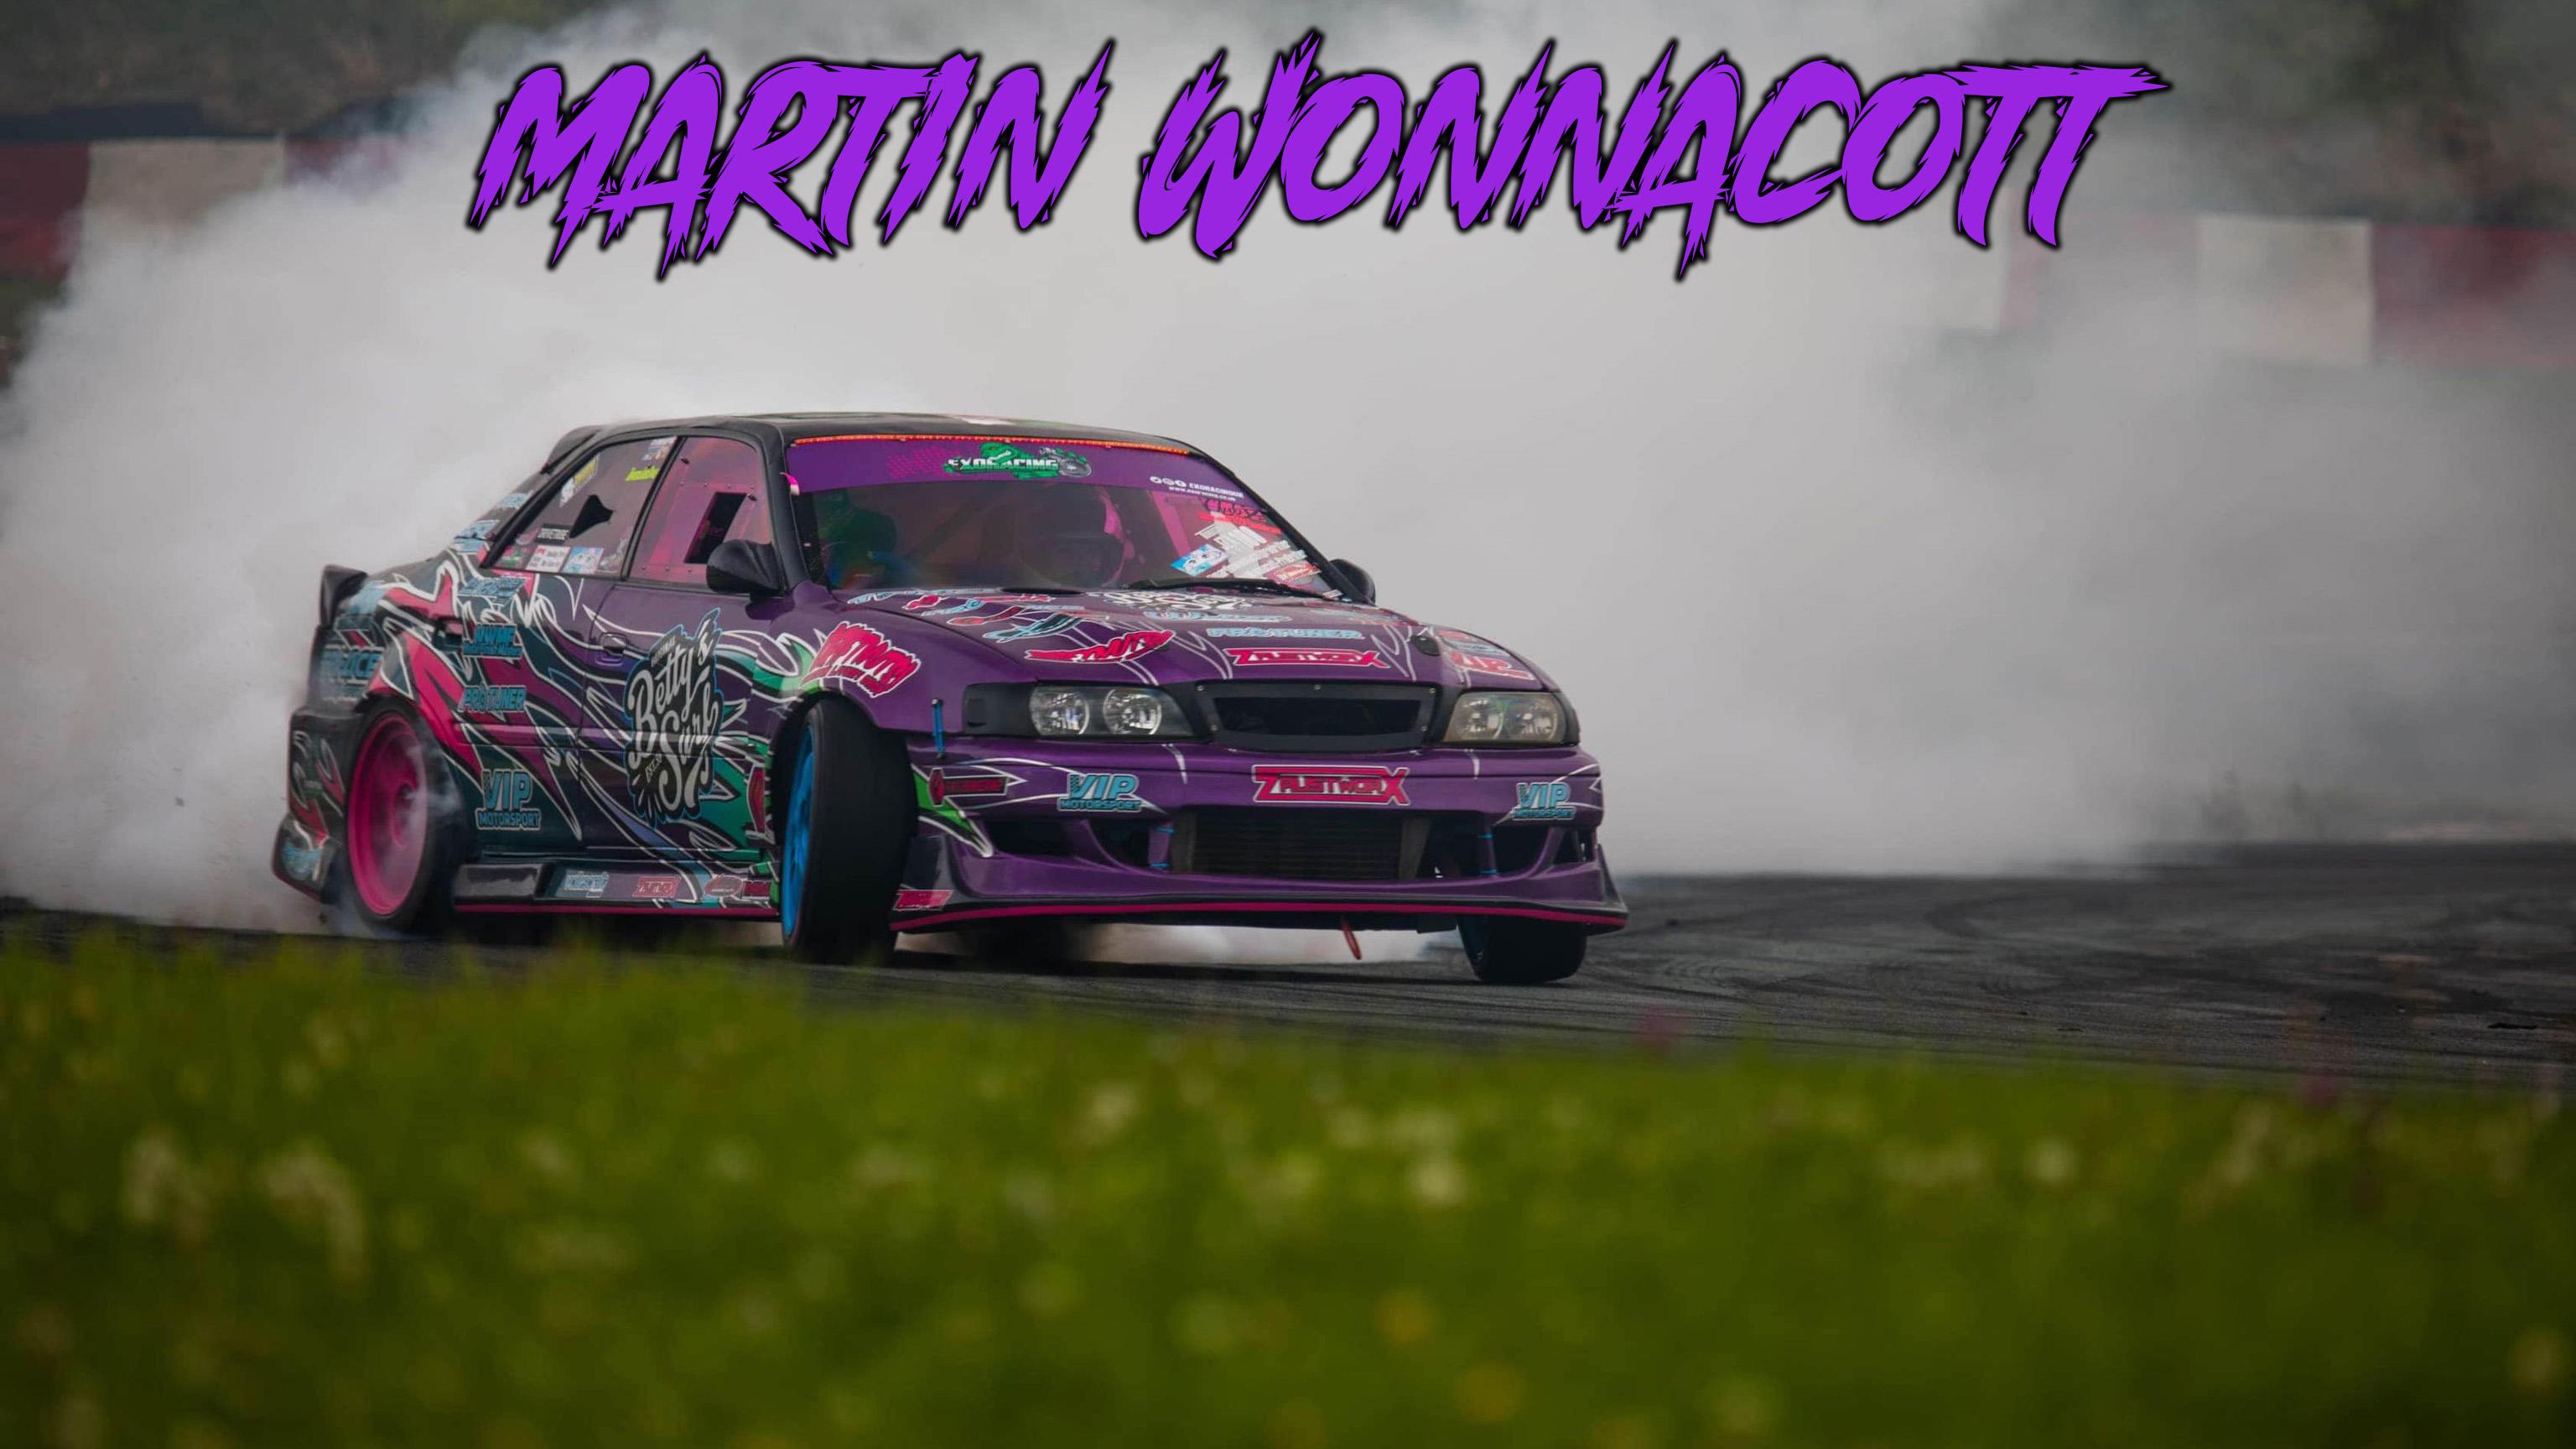 Martin Wonnacott Toyota chaser